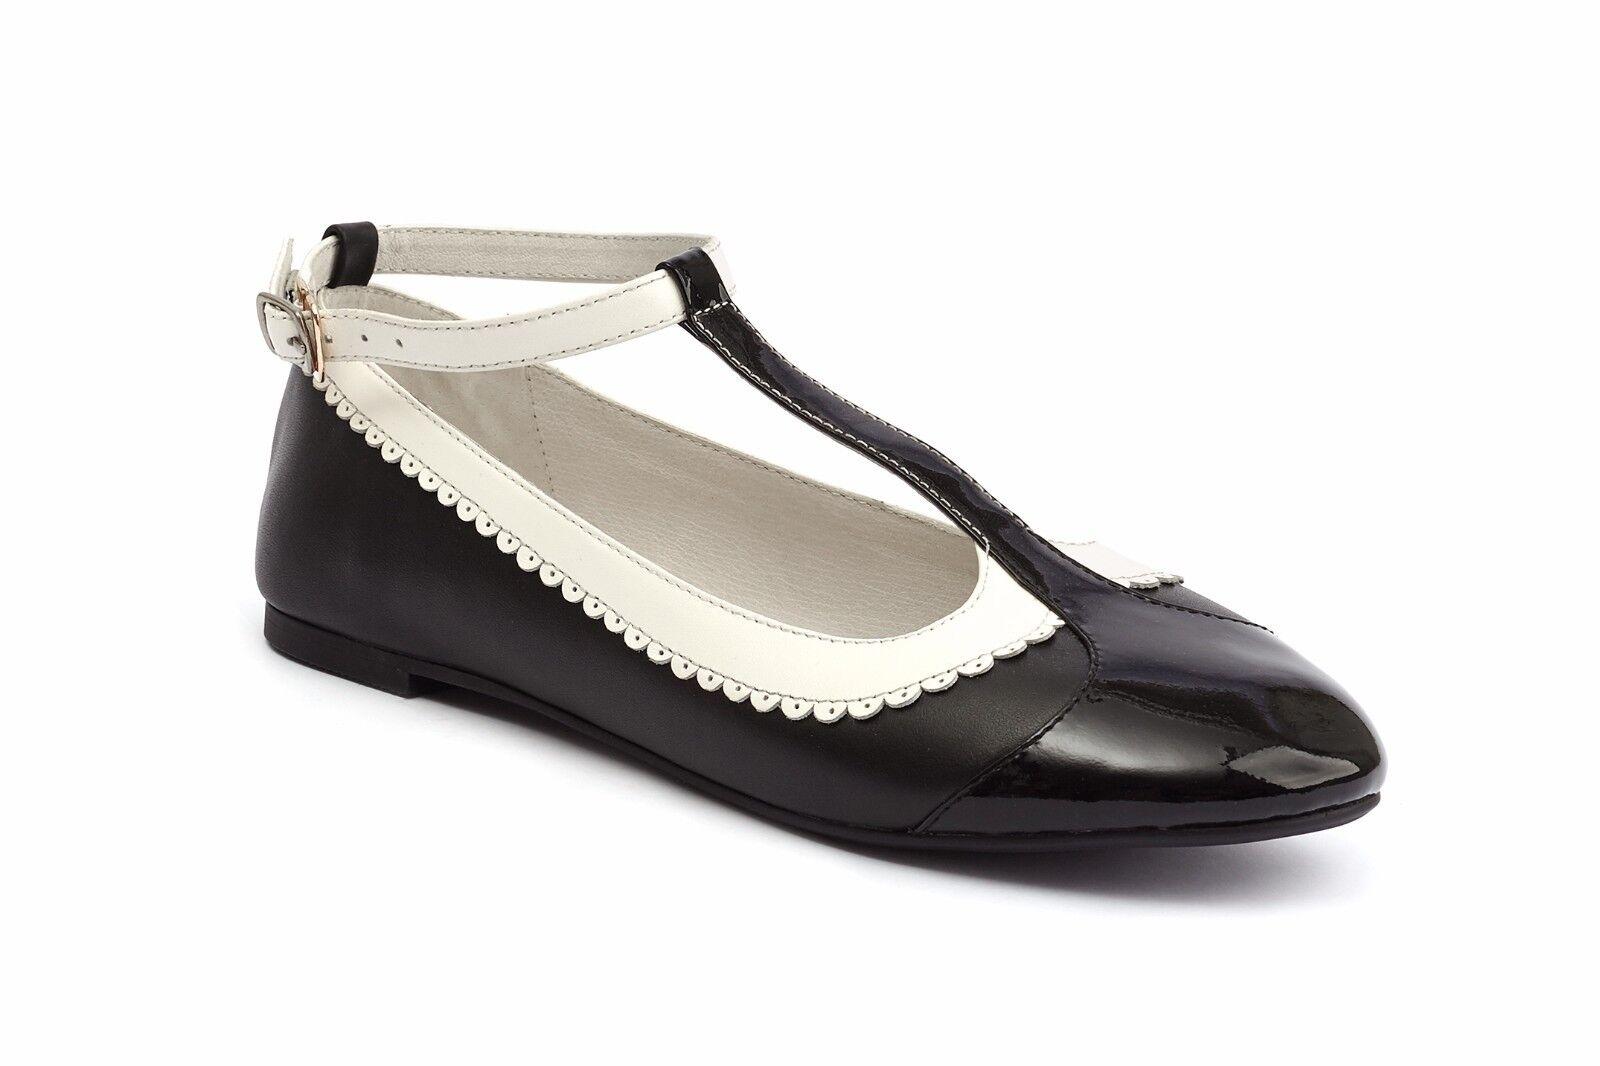 Lola Ramona Rinna Black & Cream Ballet Flat with T Bar Strap EU38 UK5